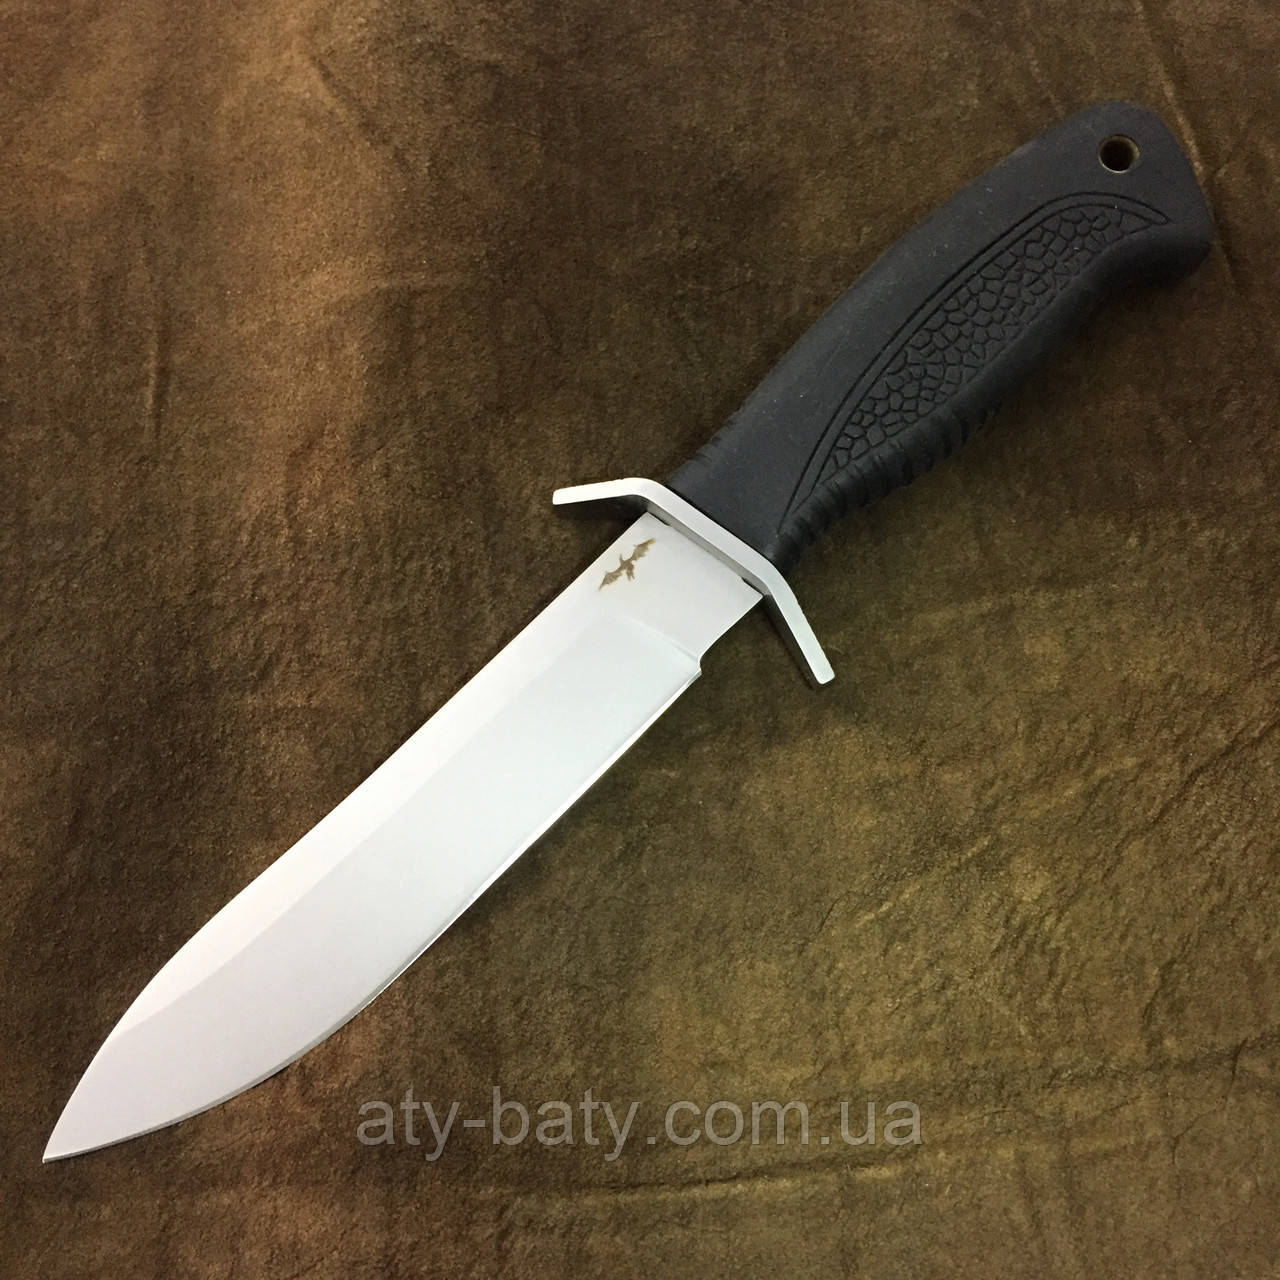 Нож НОКС Партизан (С-12) 621-242813, резина